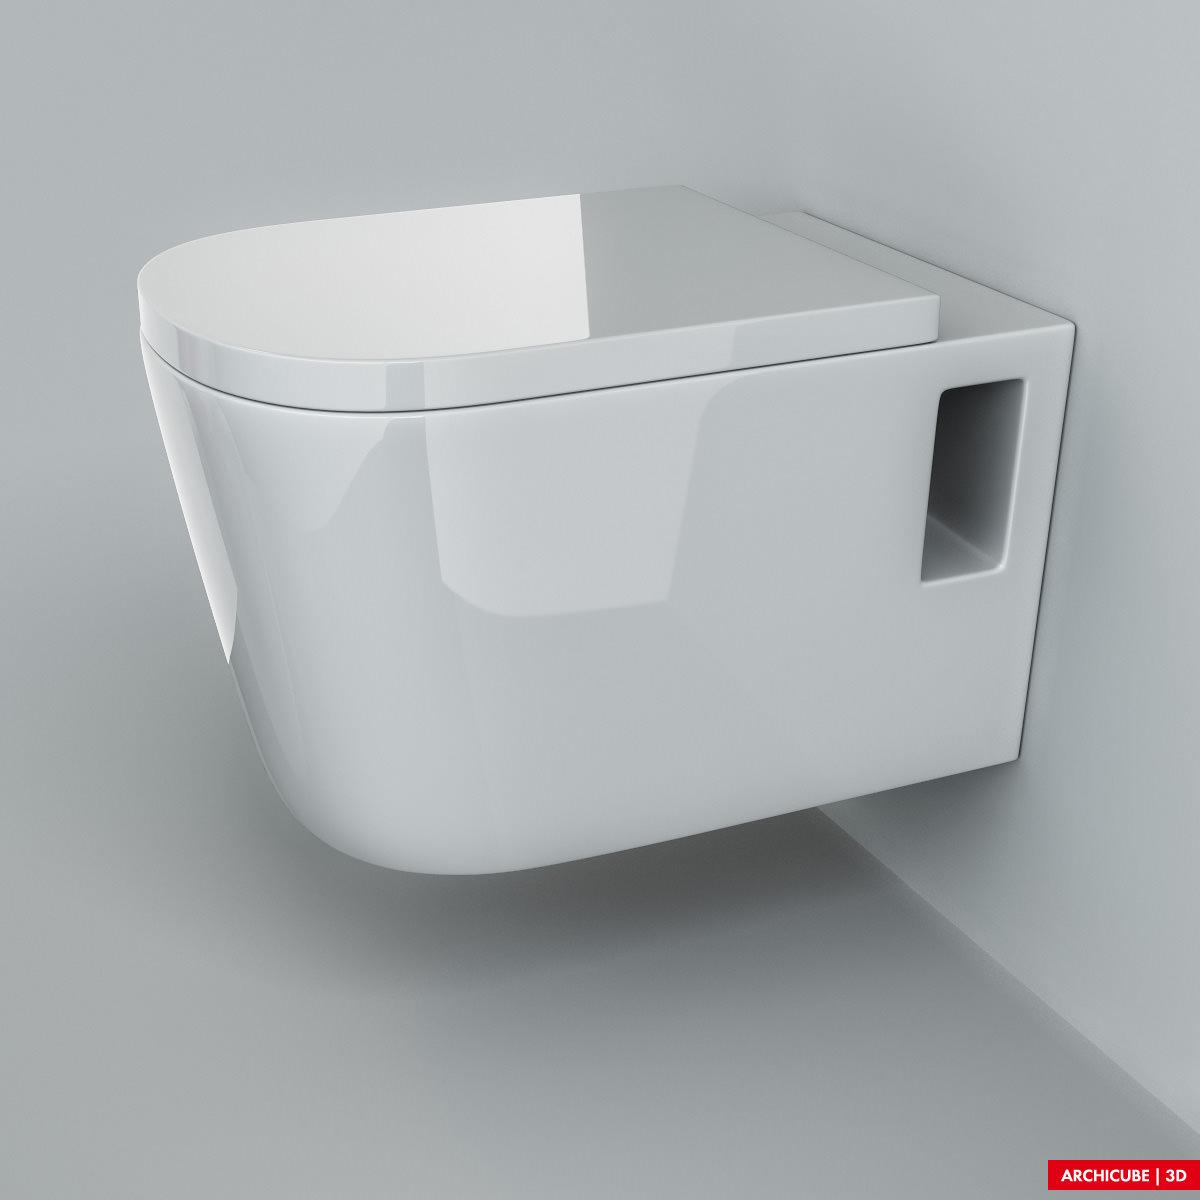 Wall mounted toilet 02 3d model max obj fbx - Toilet model ...